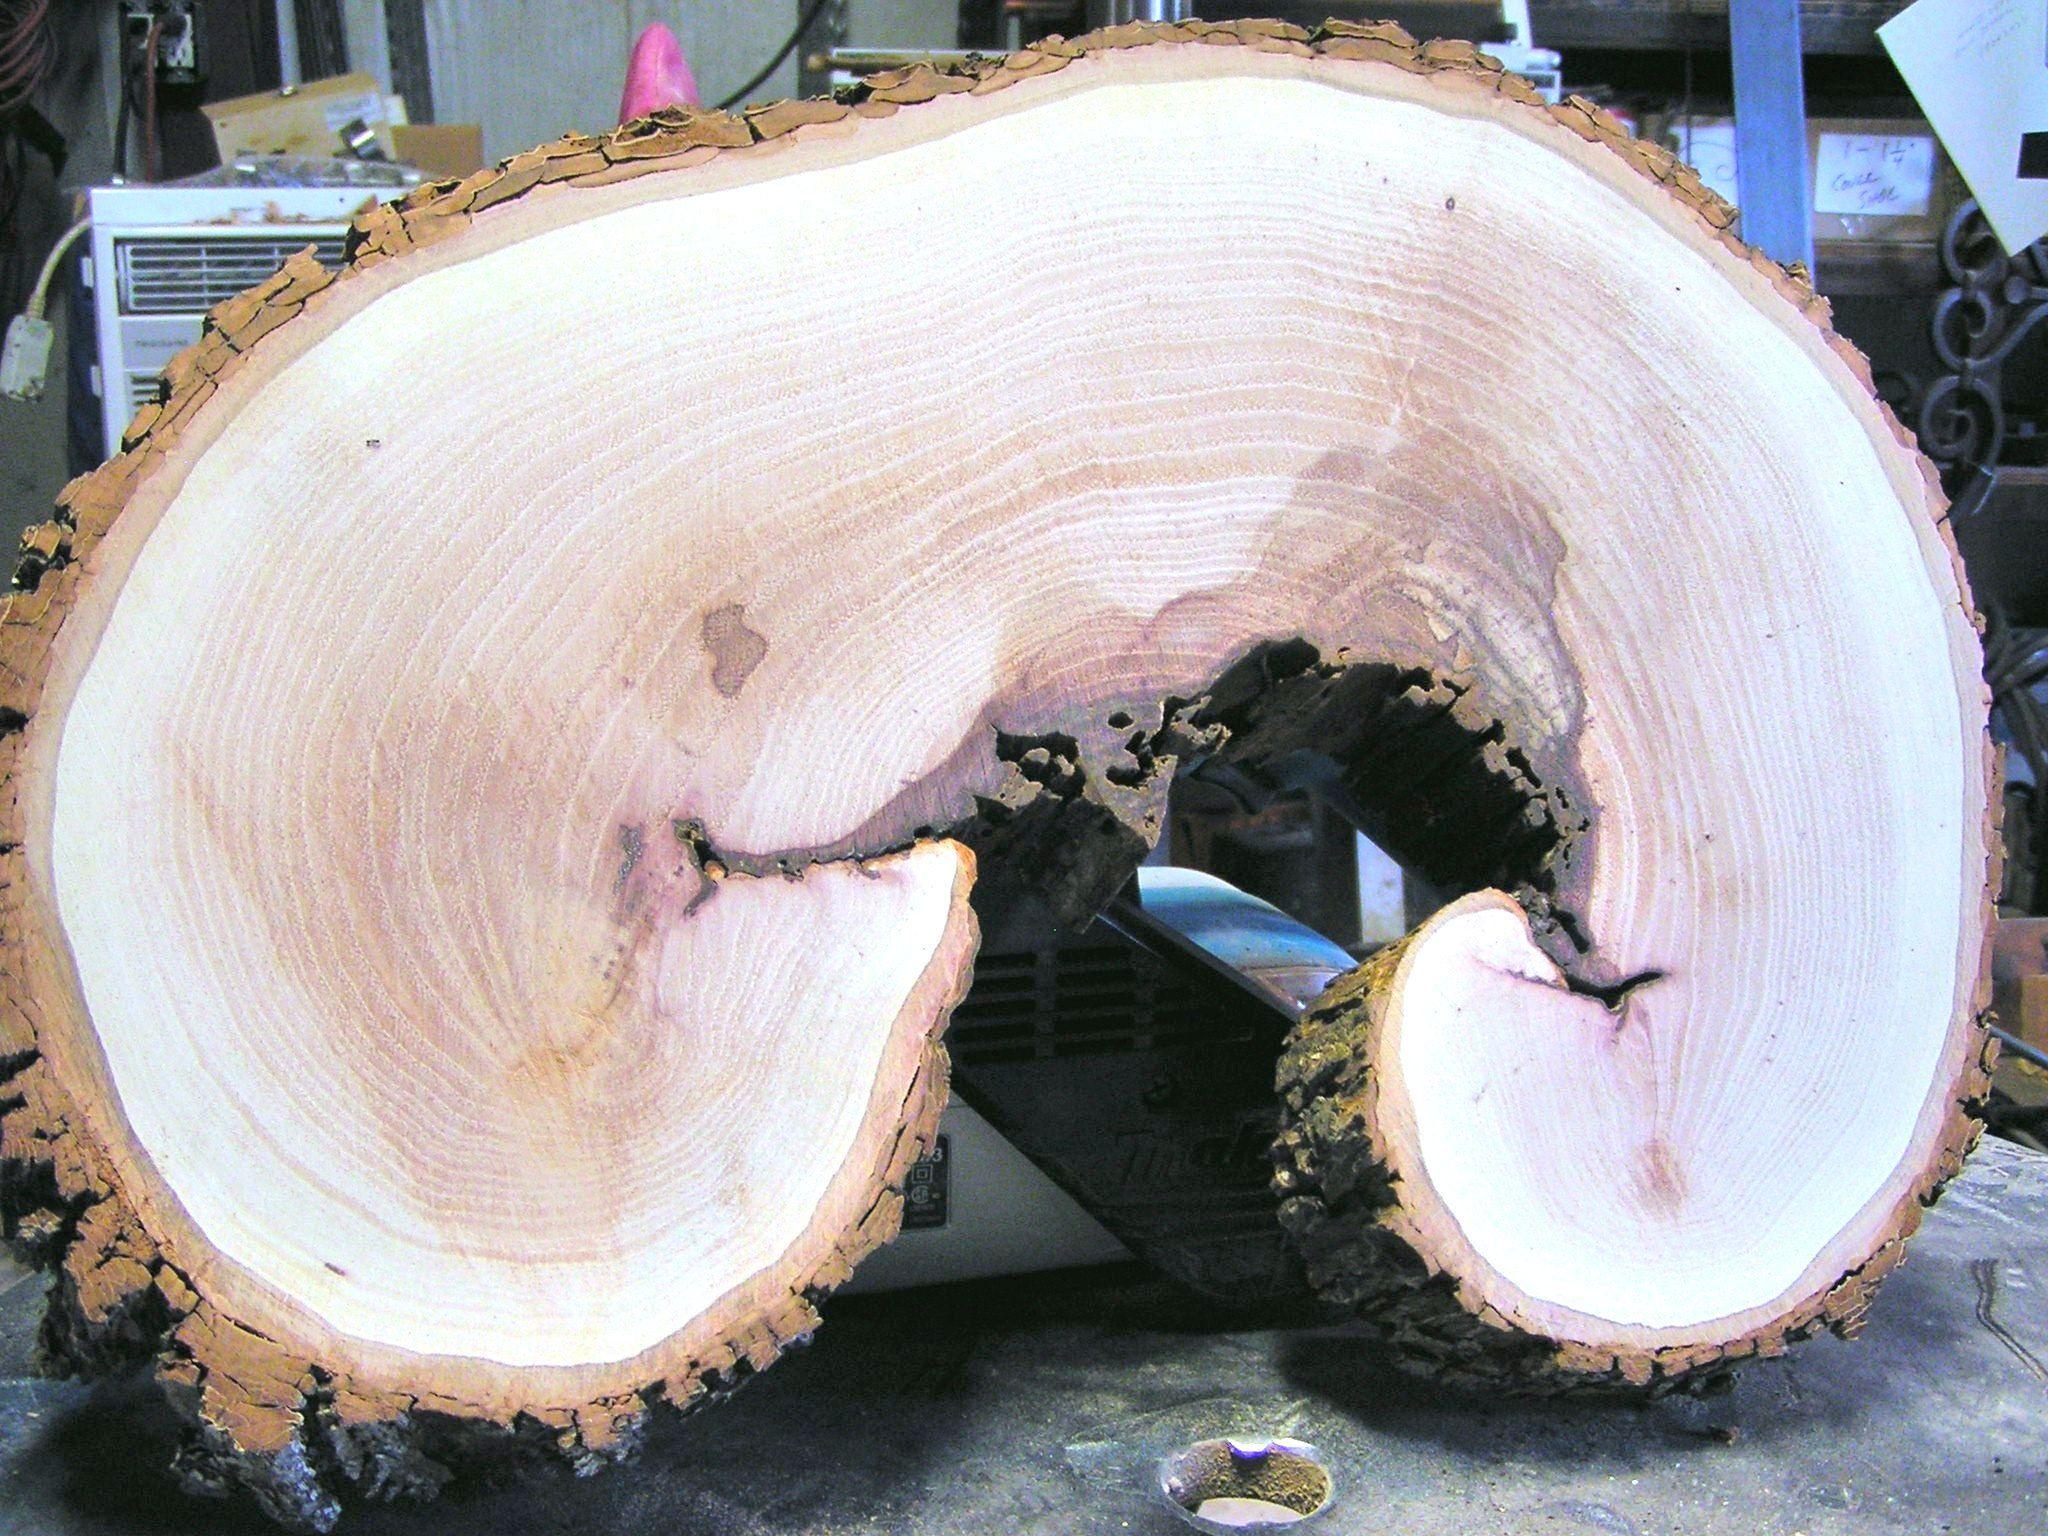 Live Edge Pecan Round Wood Slab 1 For Carving Wood Burning Painting Signs Address Markers Floating Shelf Etc Wood Slab Weather Wood Diy Wood Design